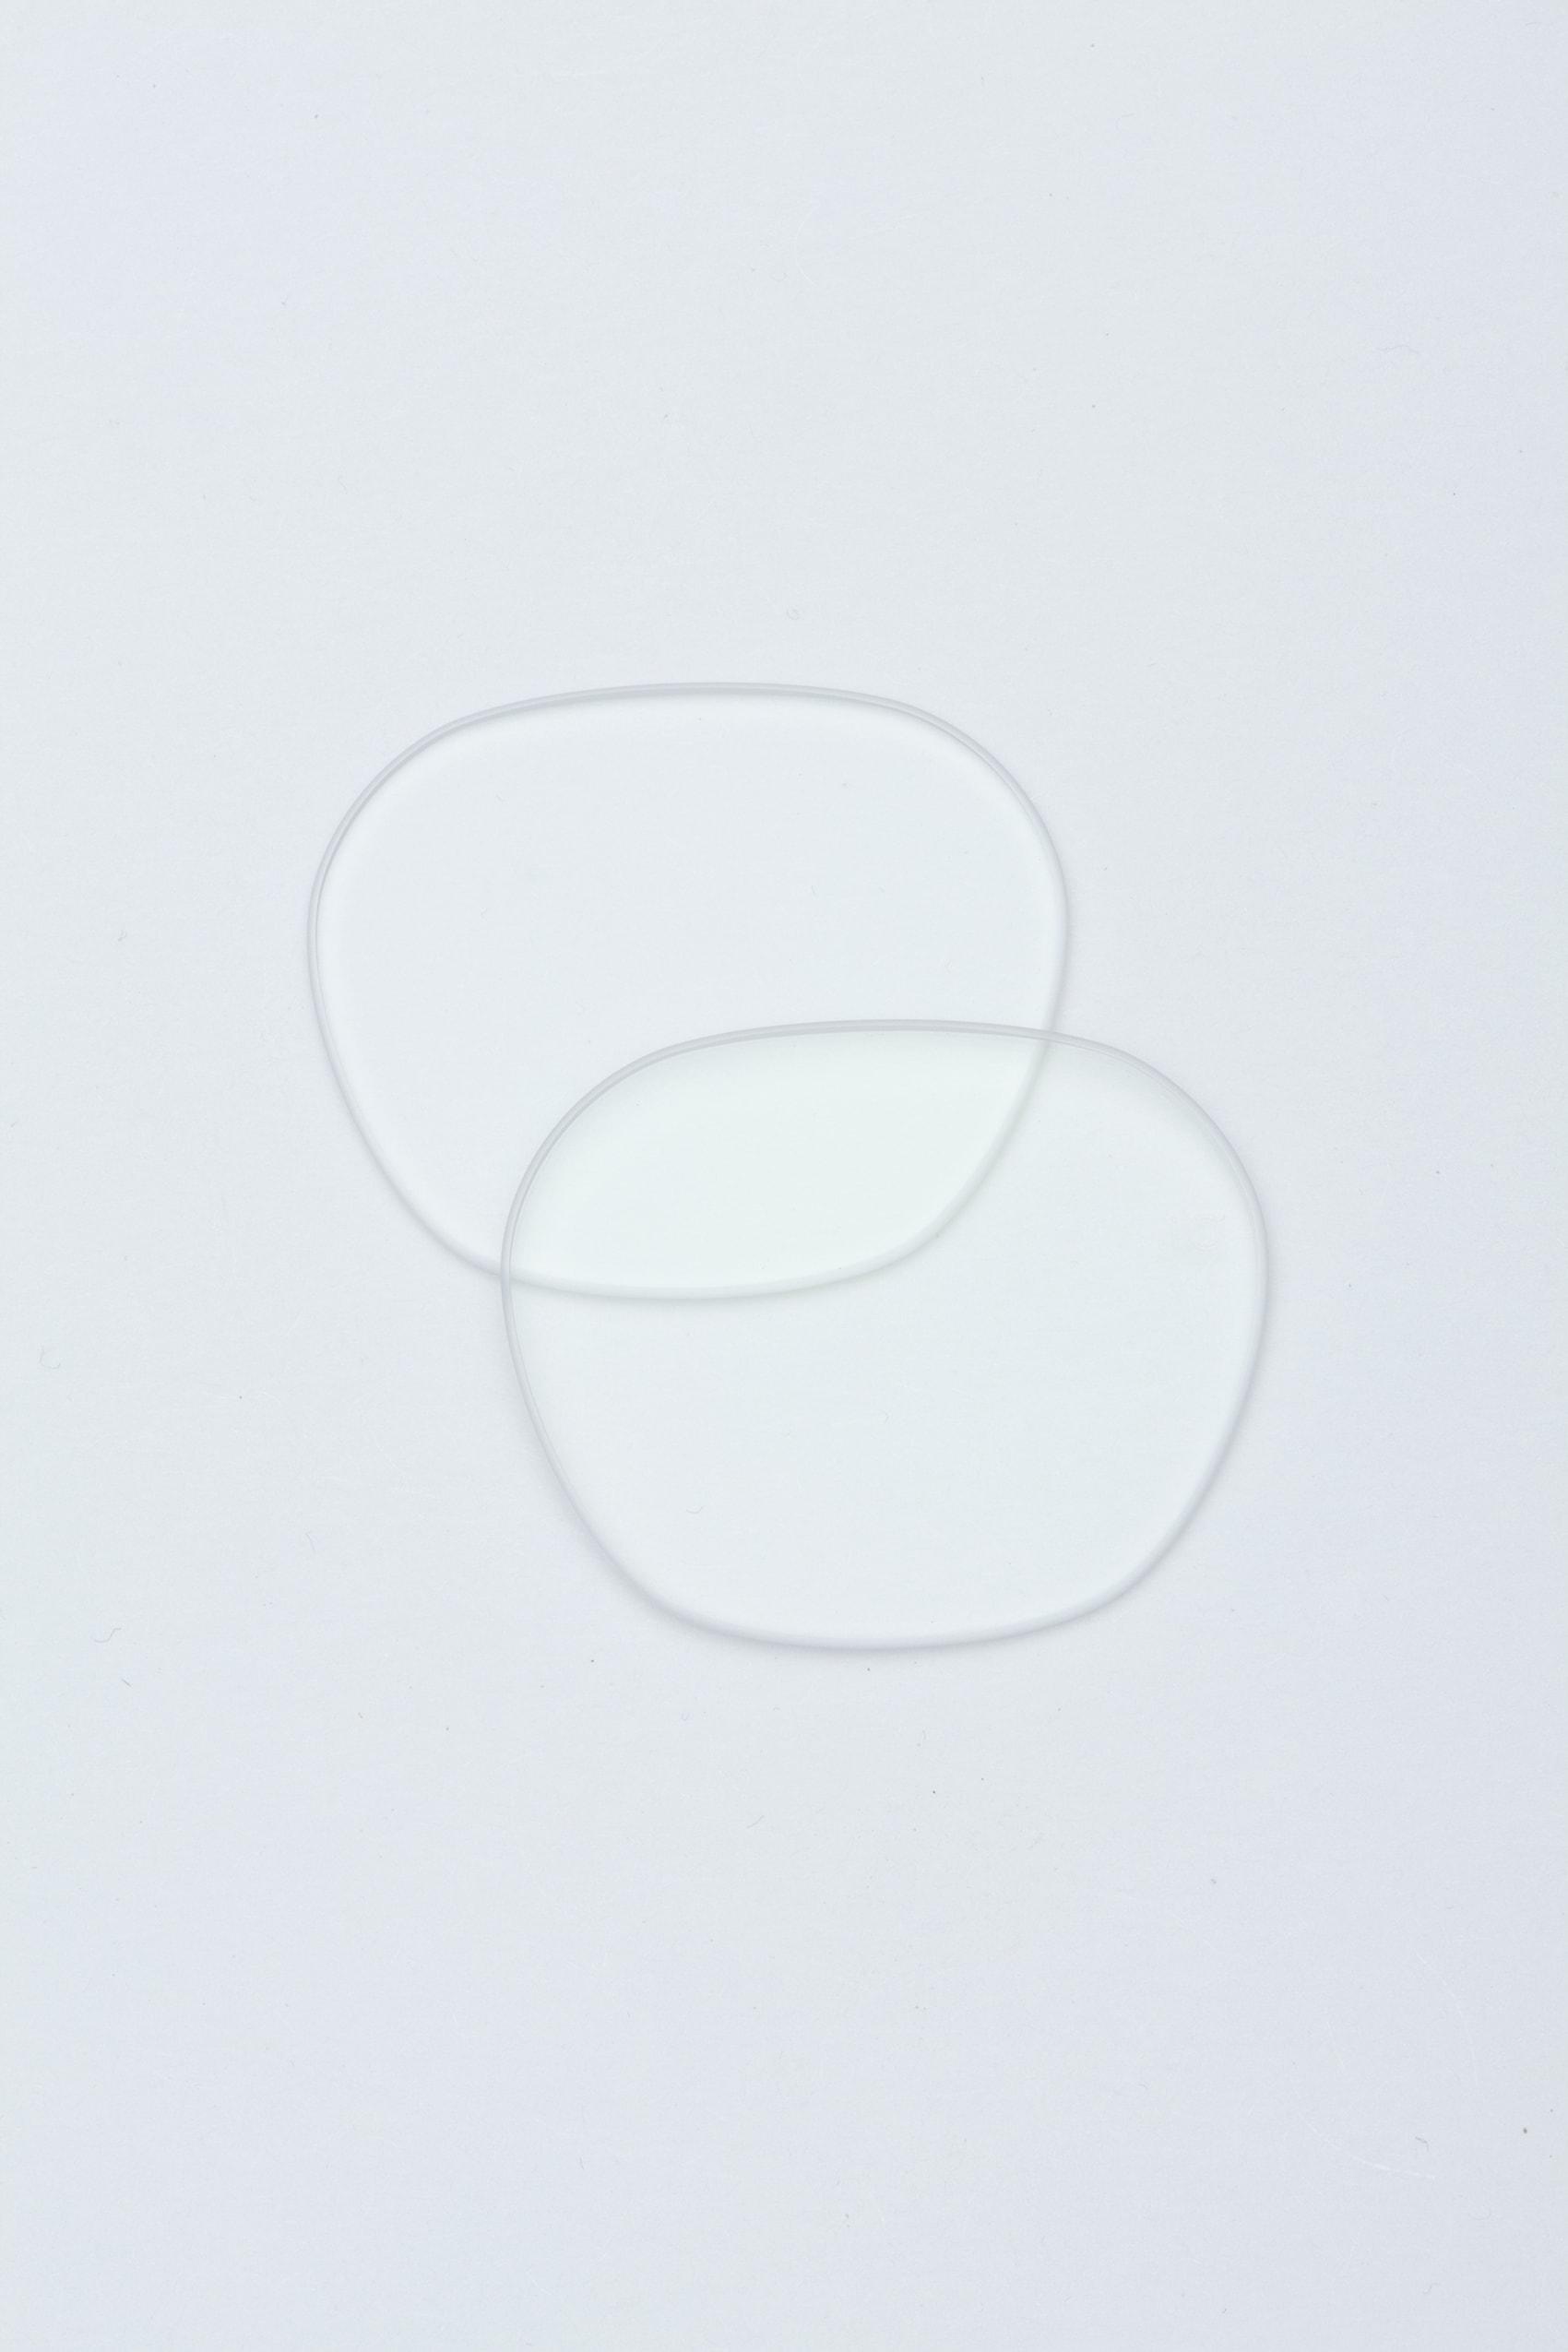 10eyevan_detail_01